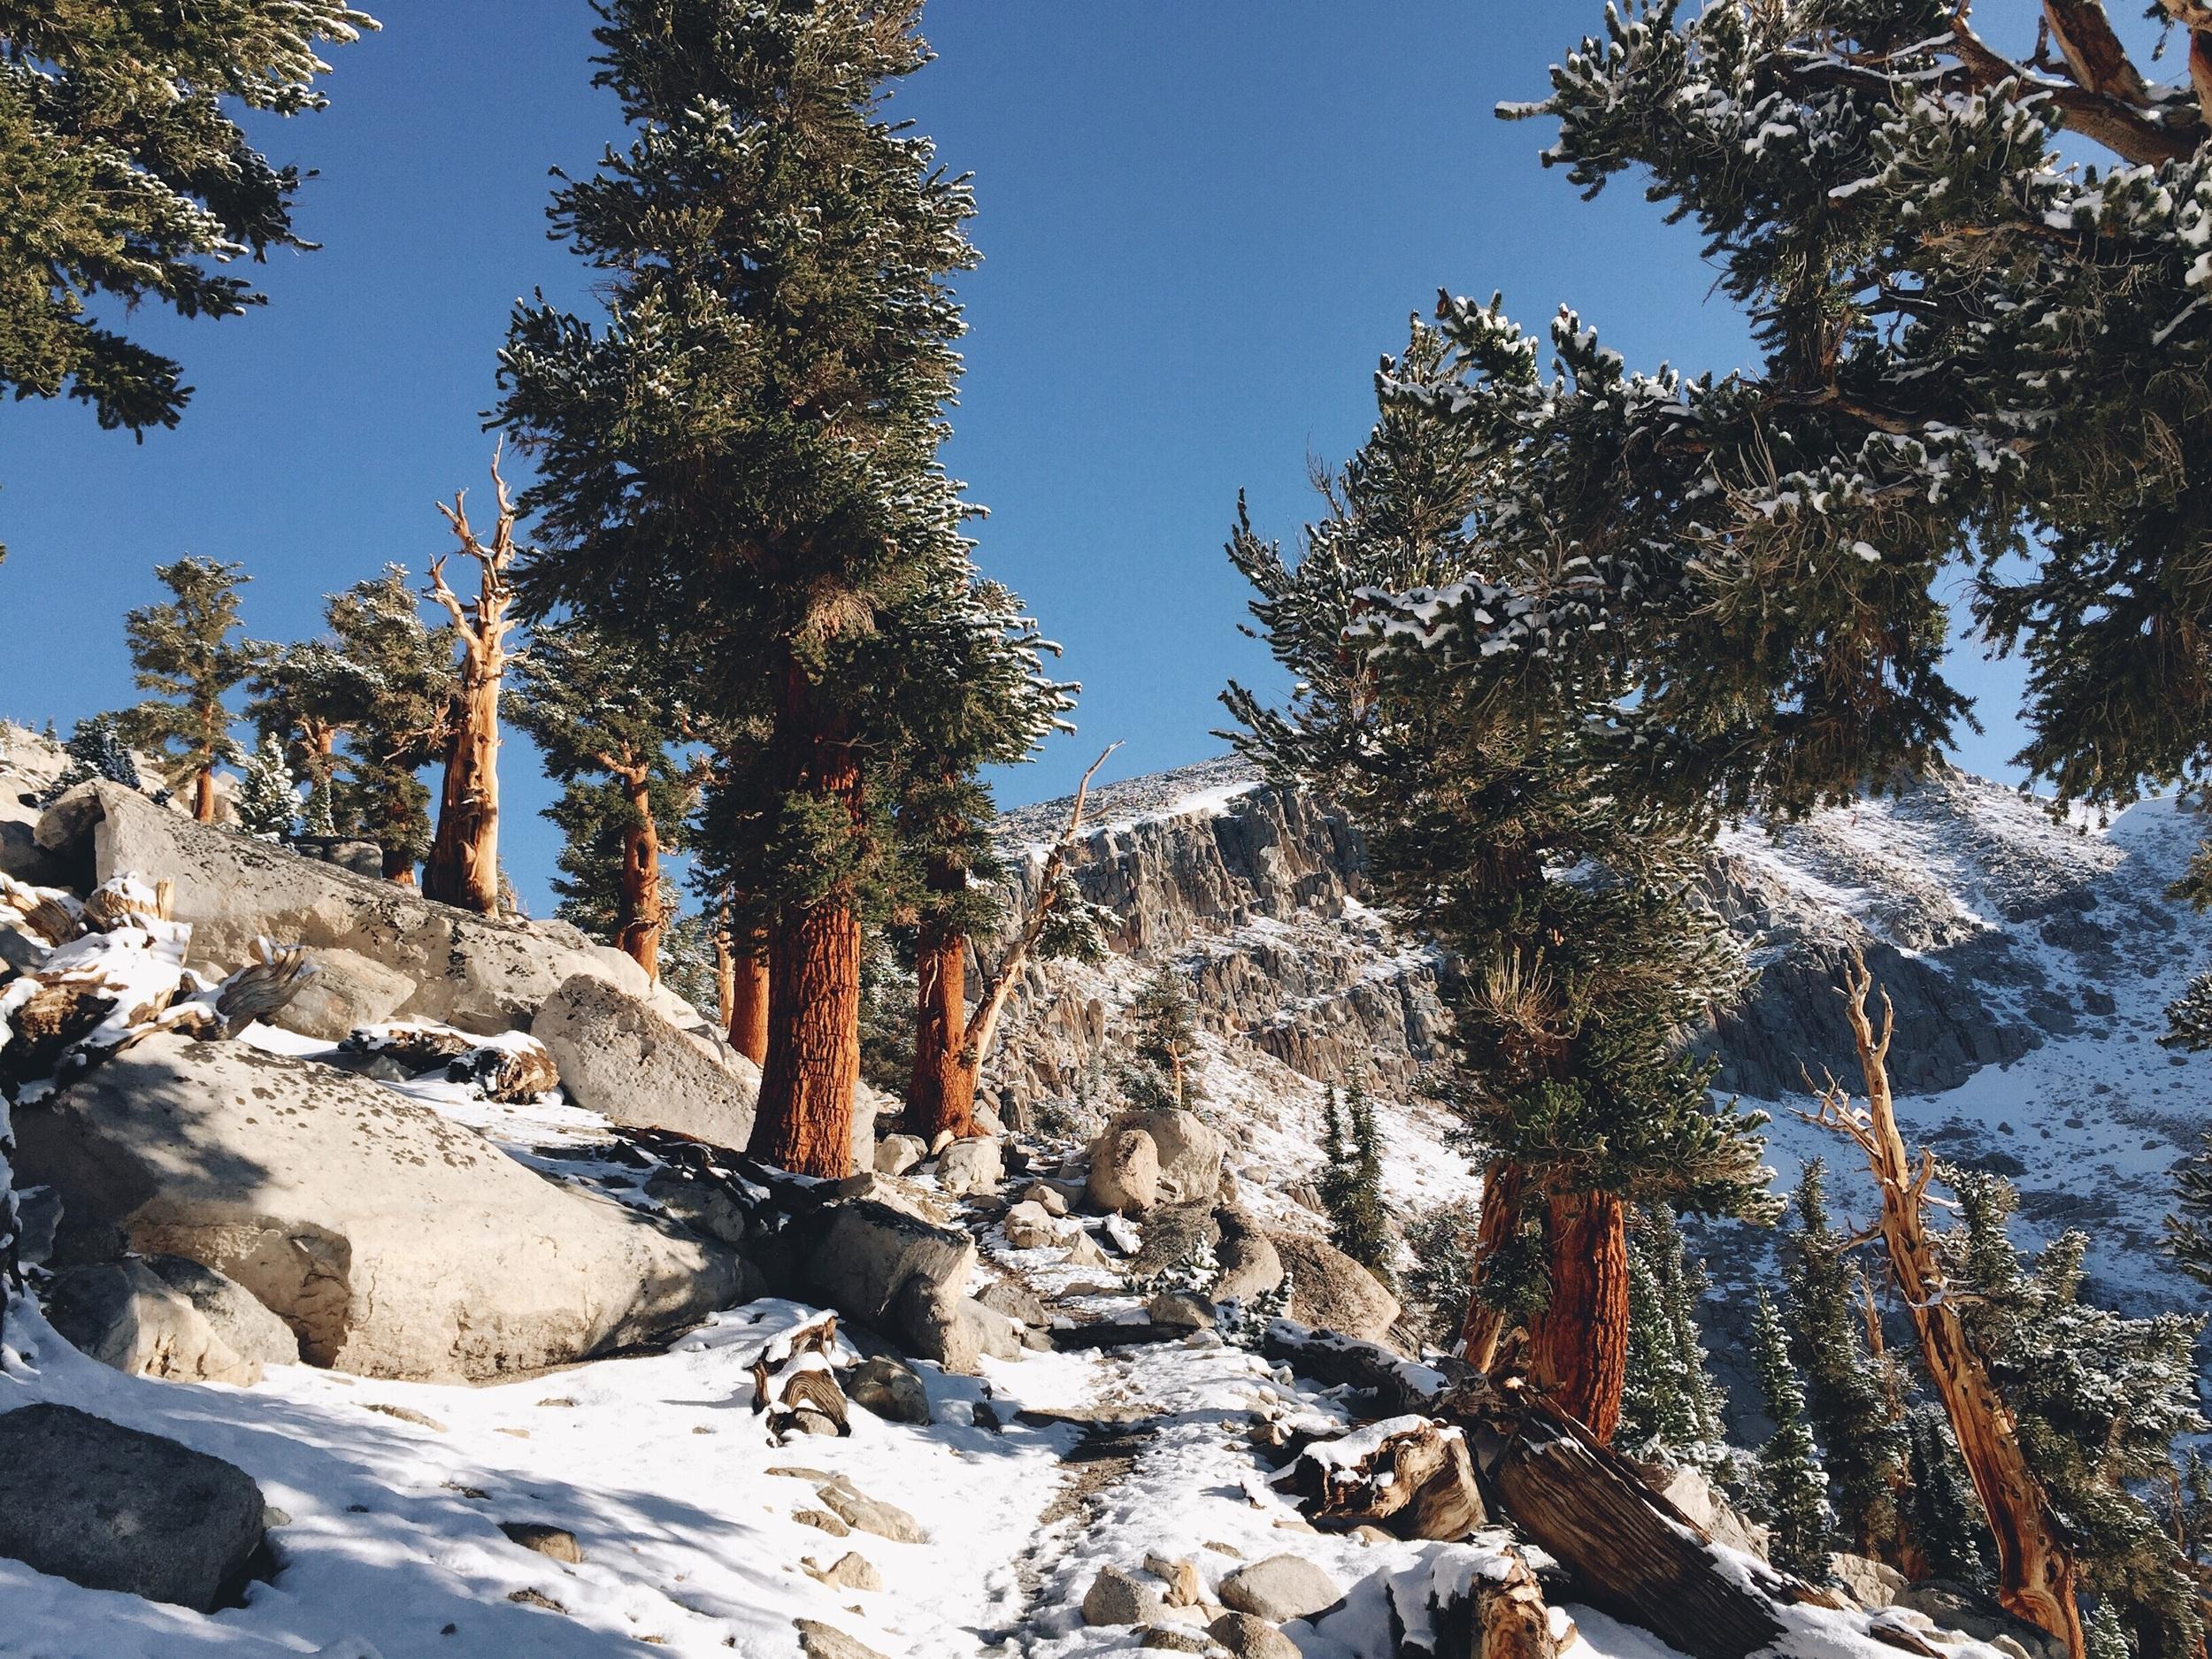 Soooo pretty. All the trees.